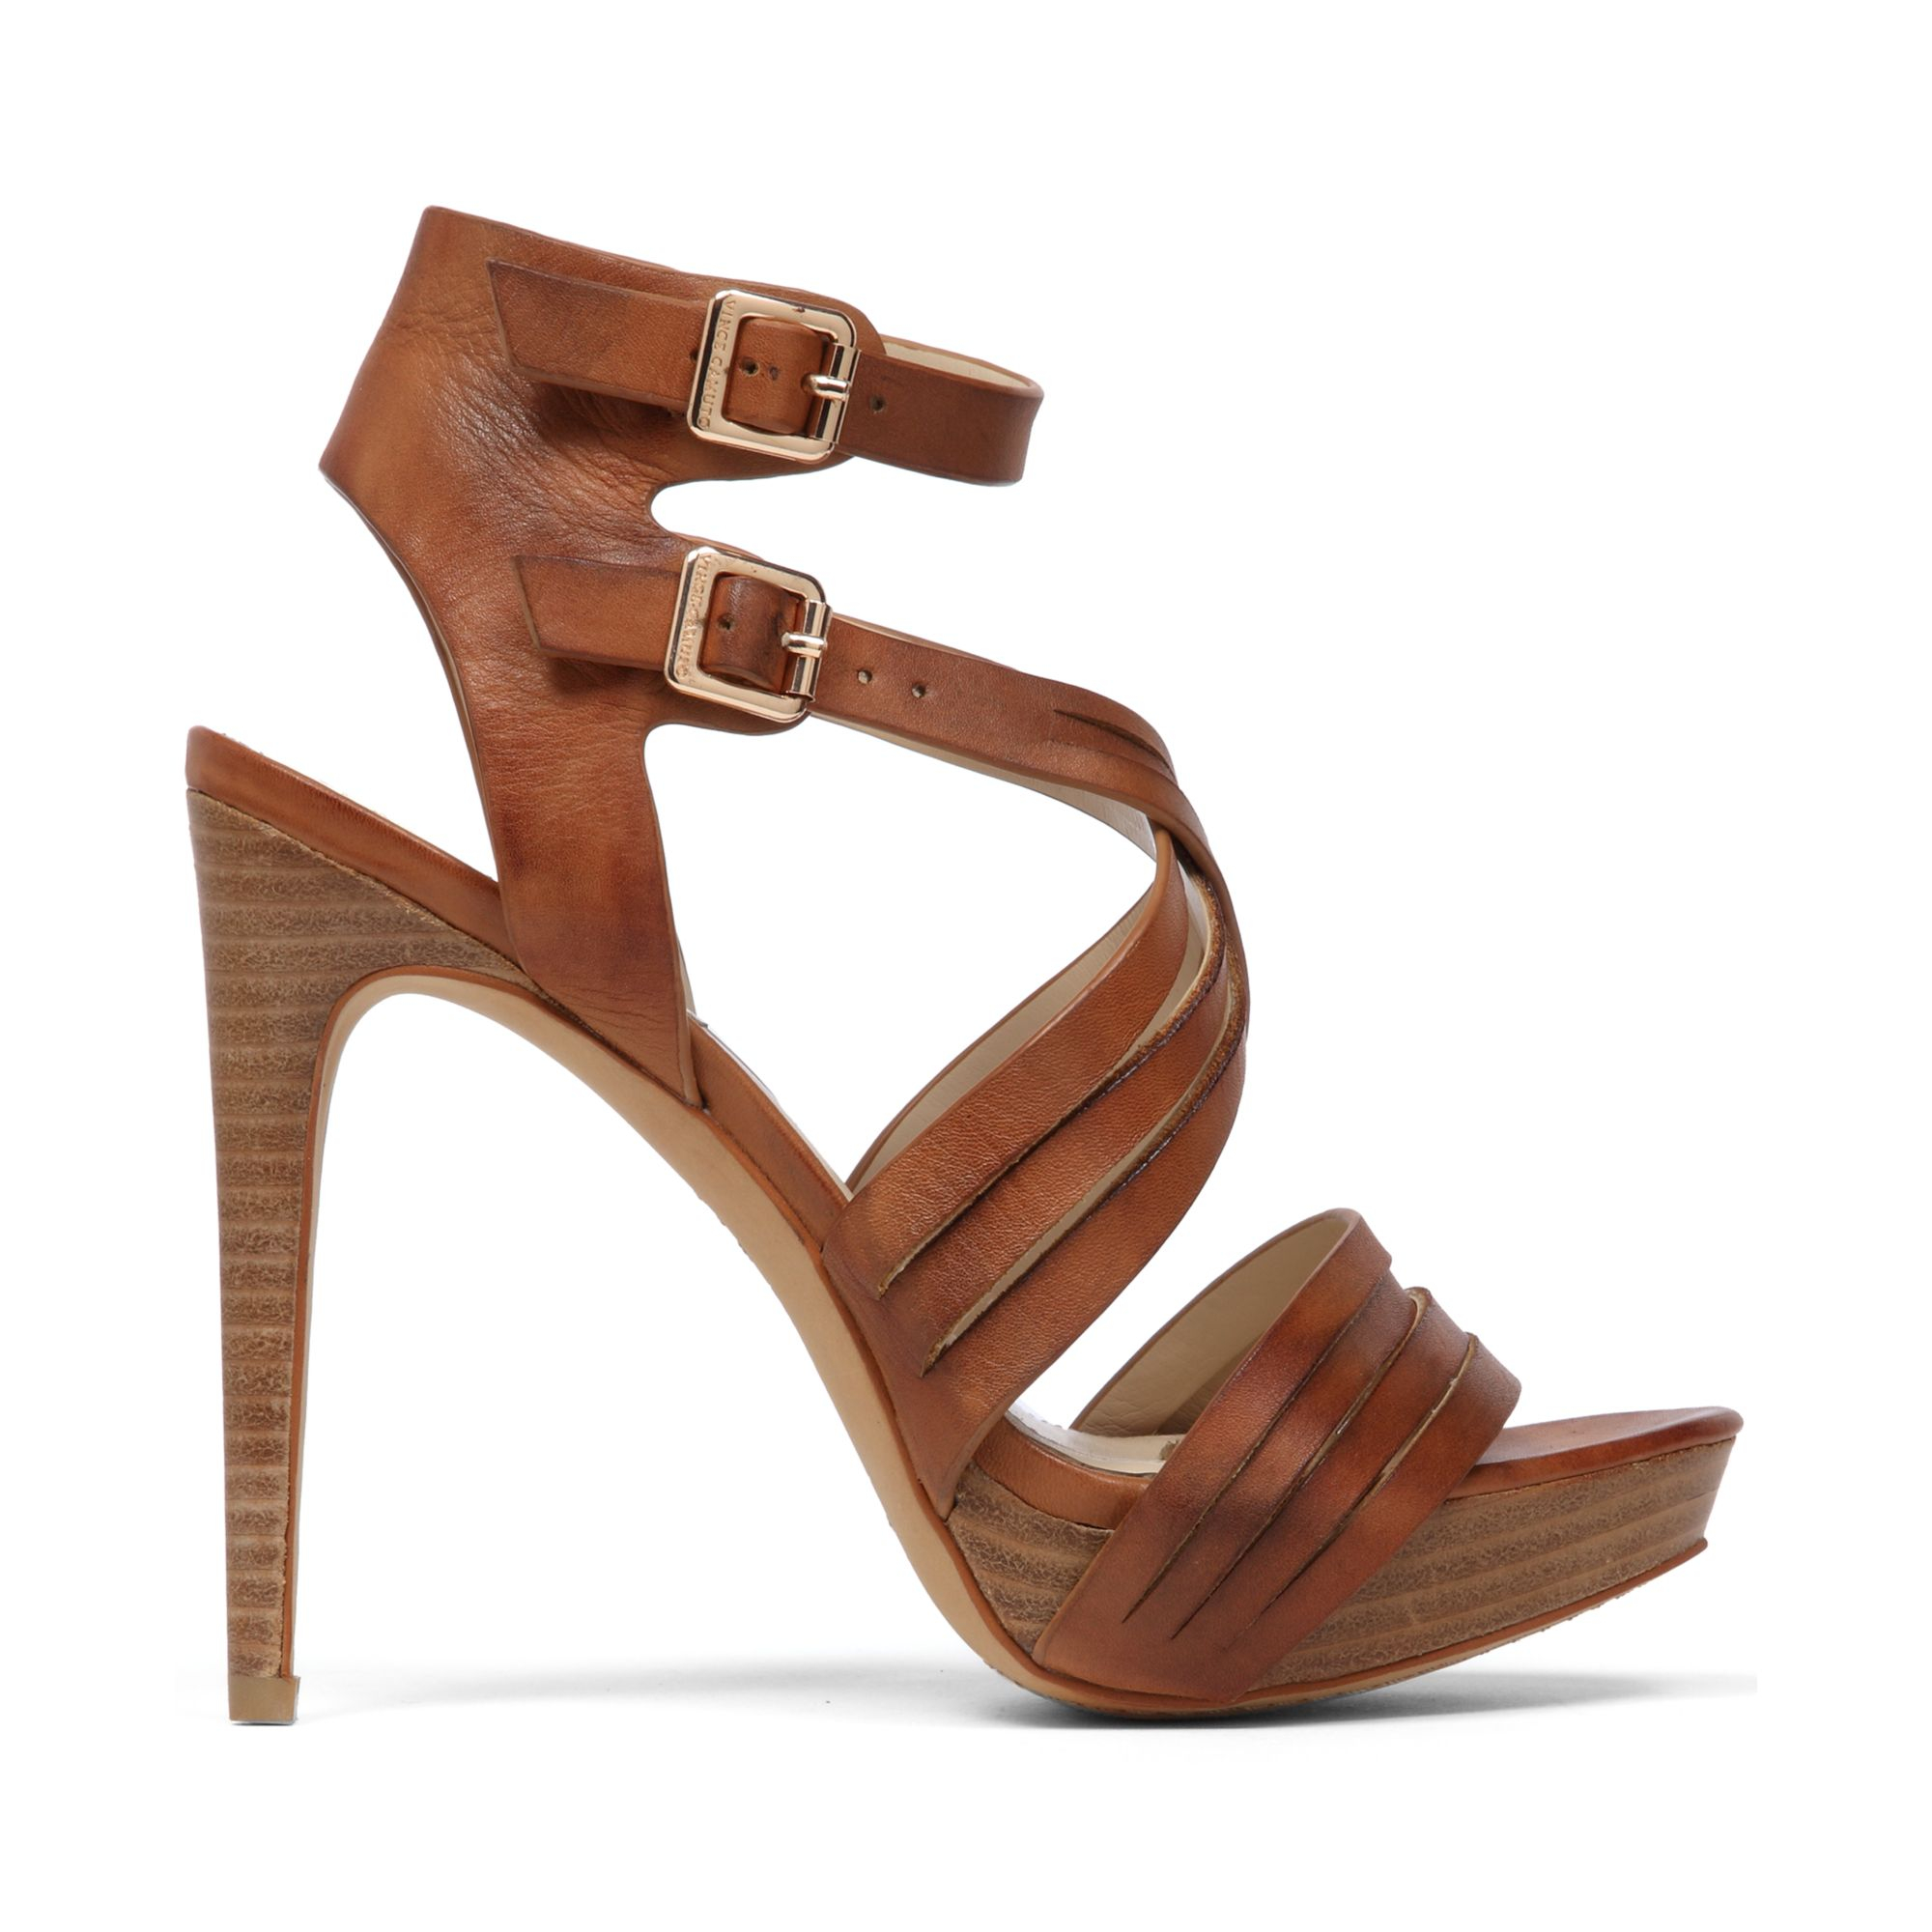 Lyst Vince Camuto Jistil High Heel Platform Sandals In Brown